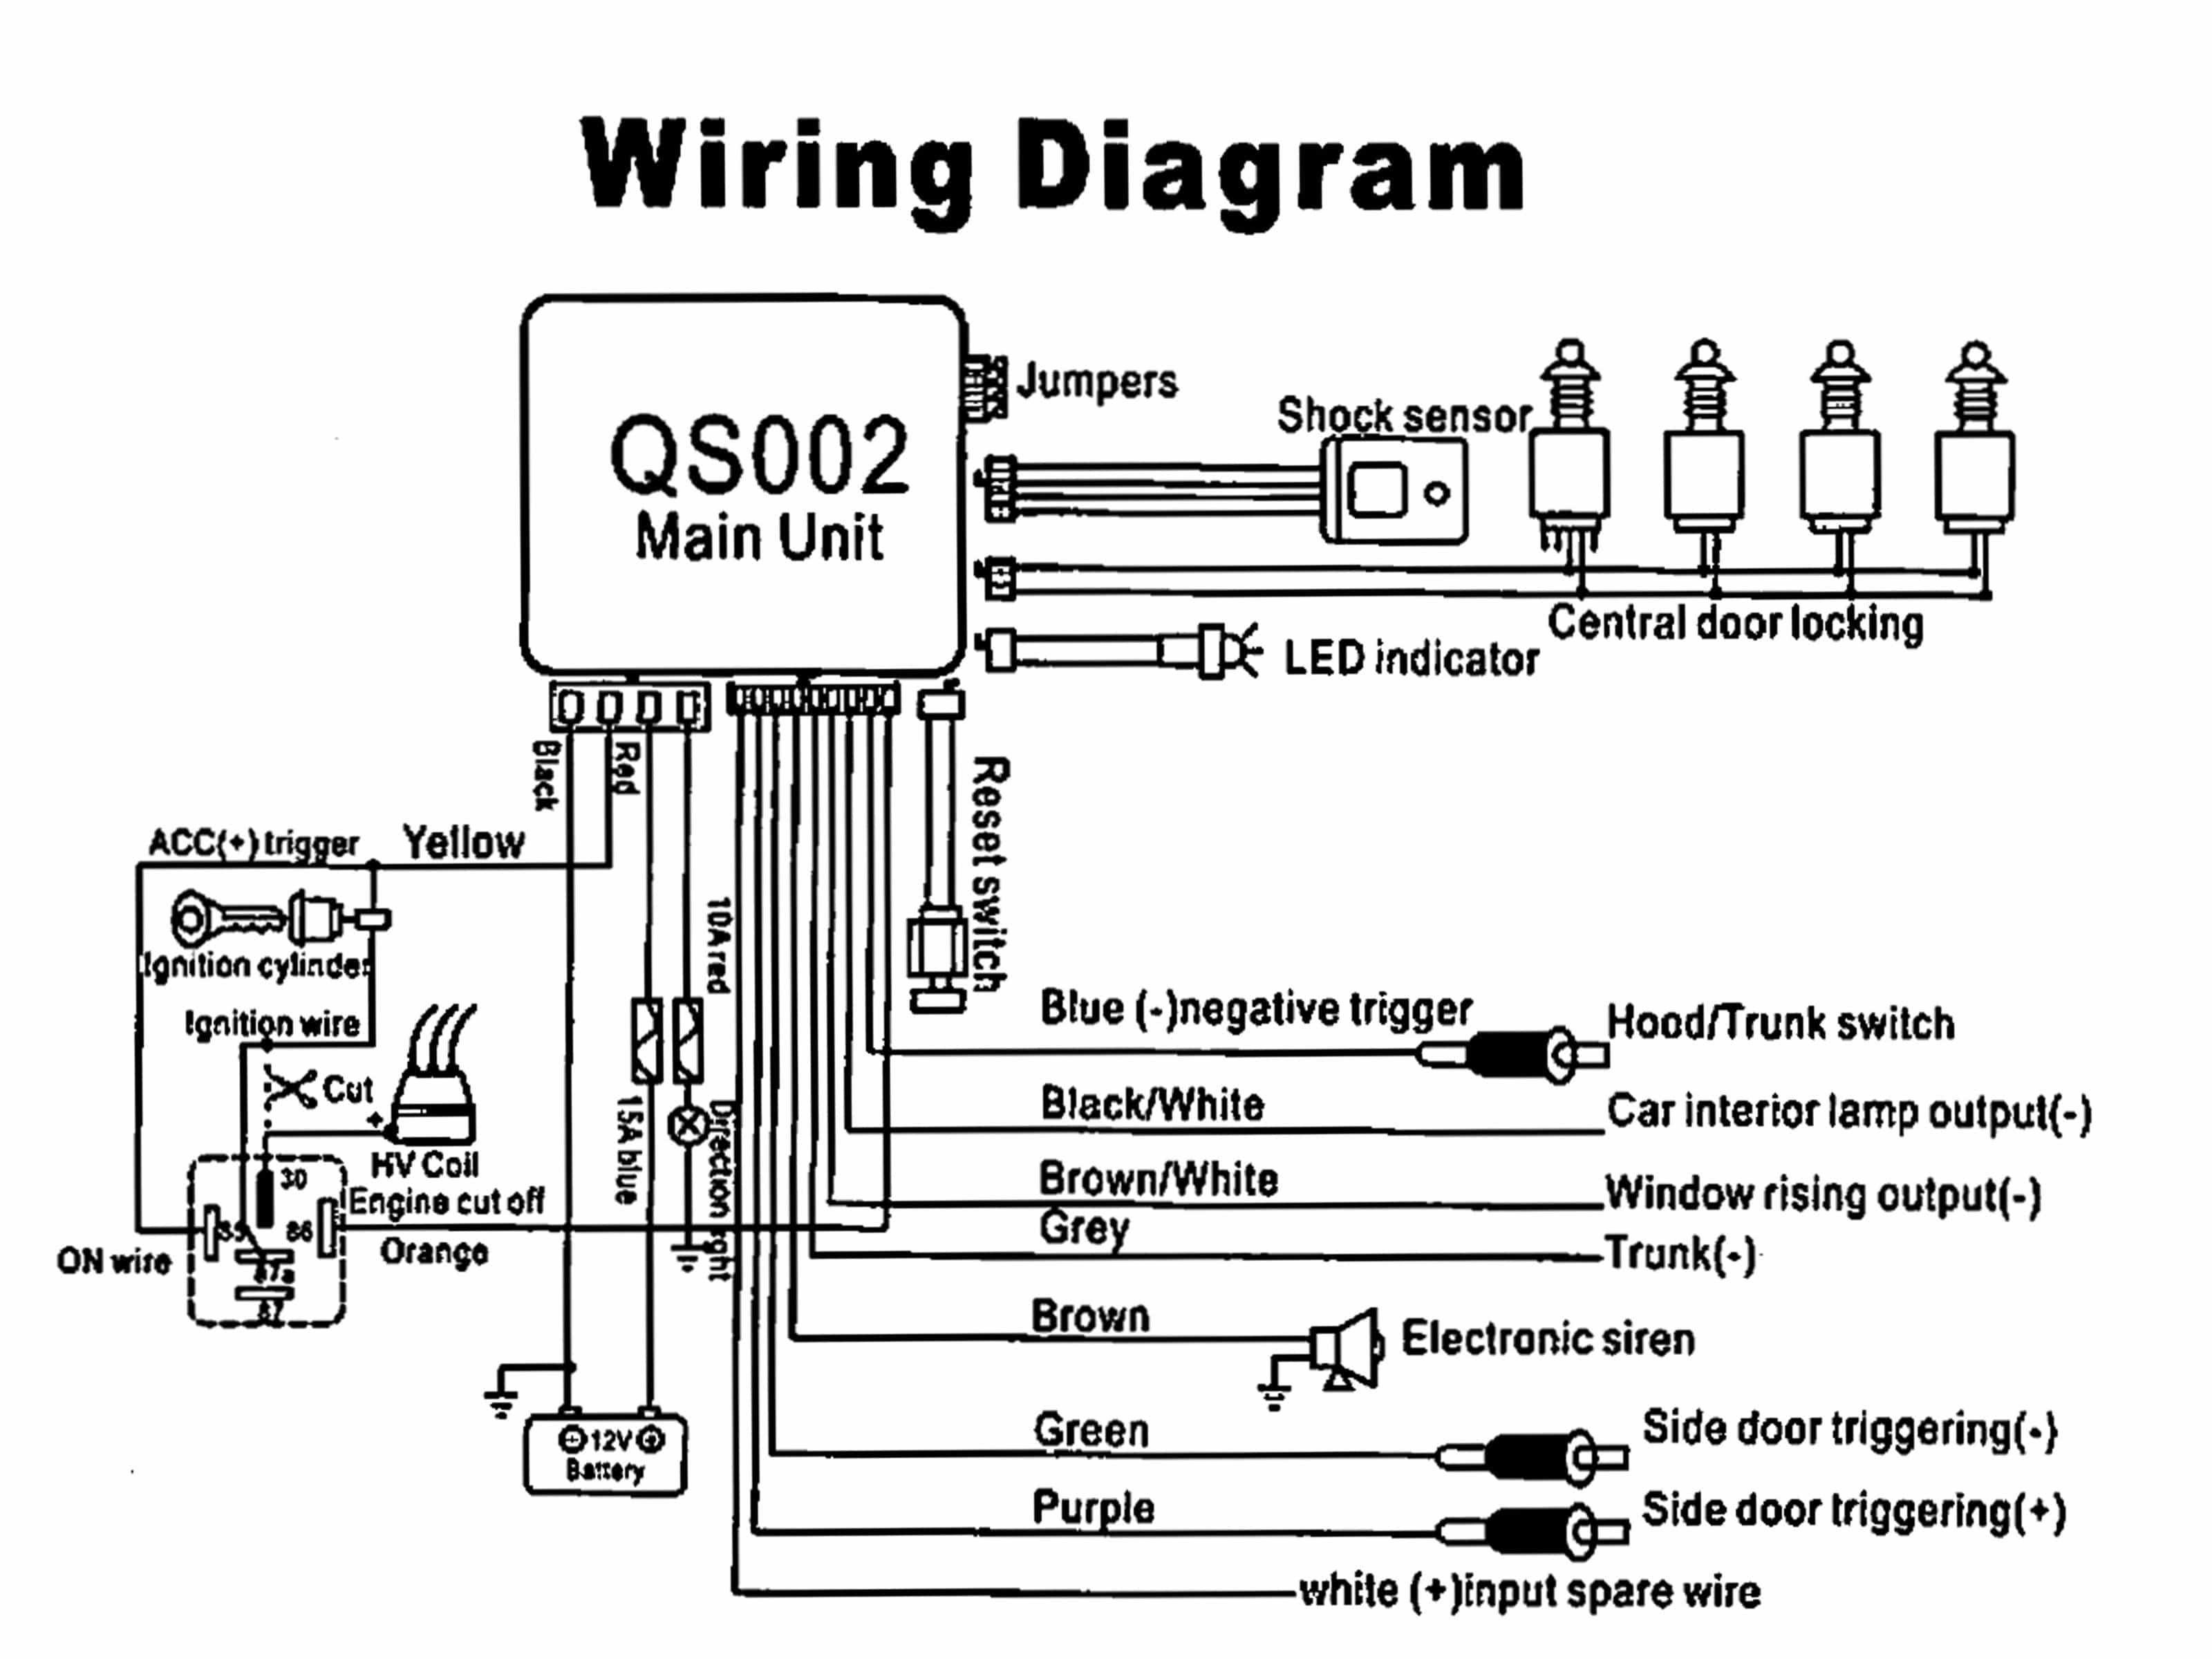 Chevy Alarm Wiring Diagram - Wiring Diagrams justify camp-bark -  camp-bark.olimpiafirenze.itcamp-bark.olimpiafirenze.it